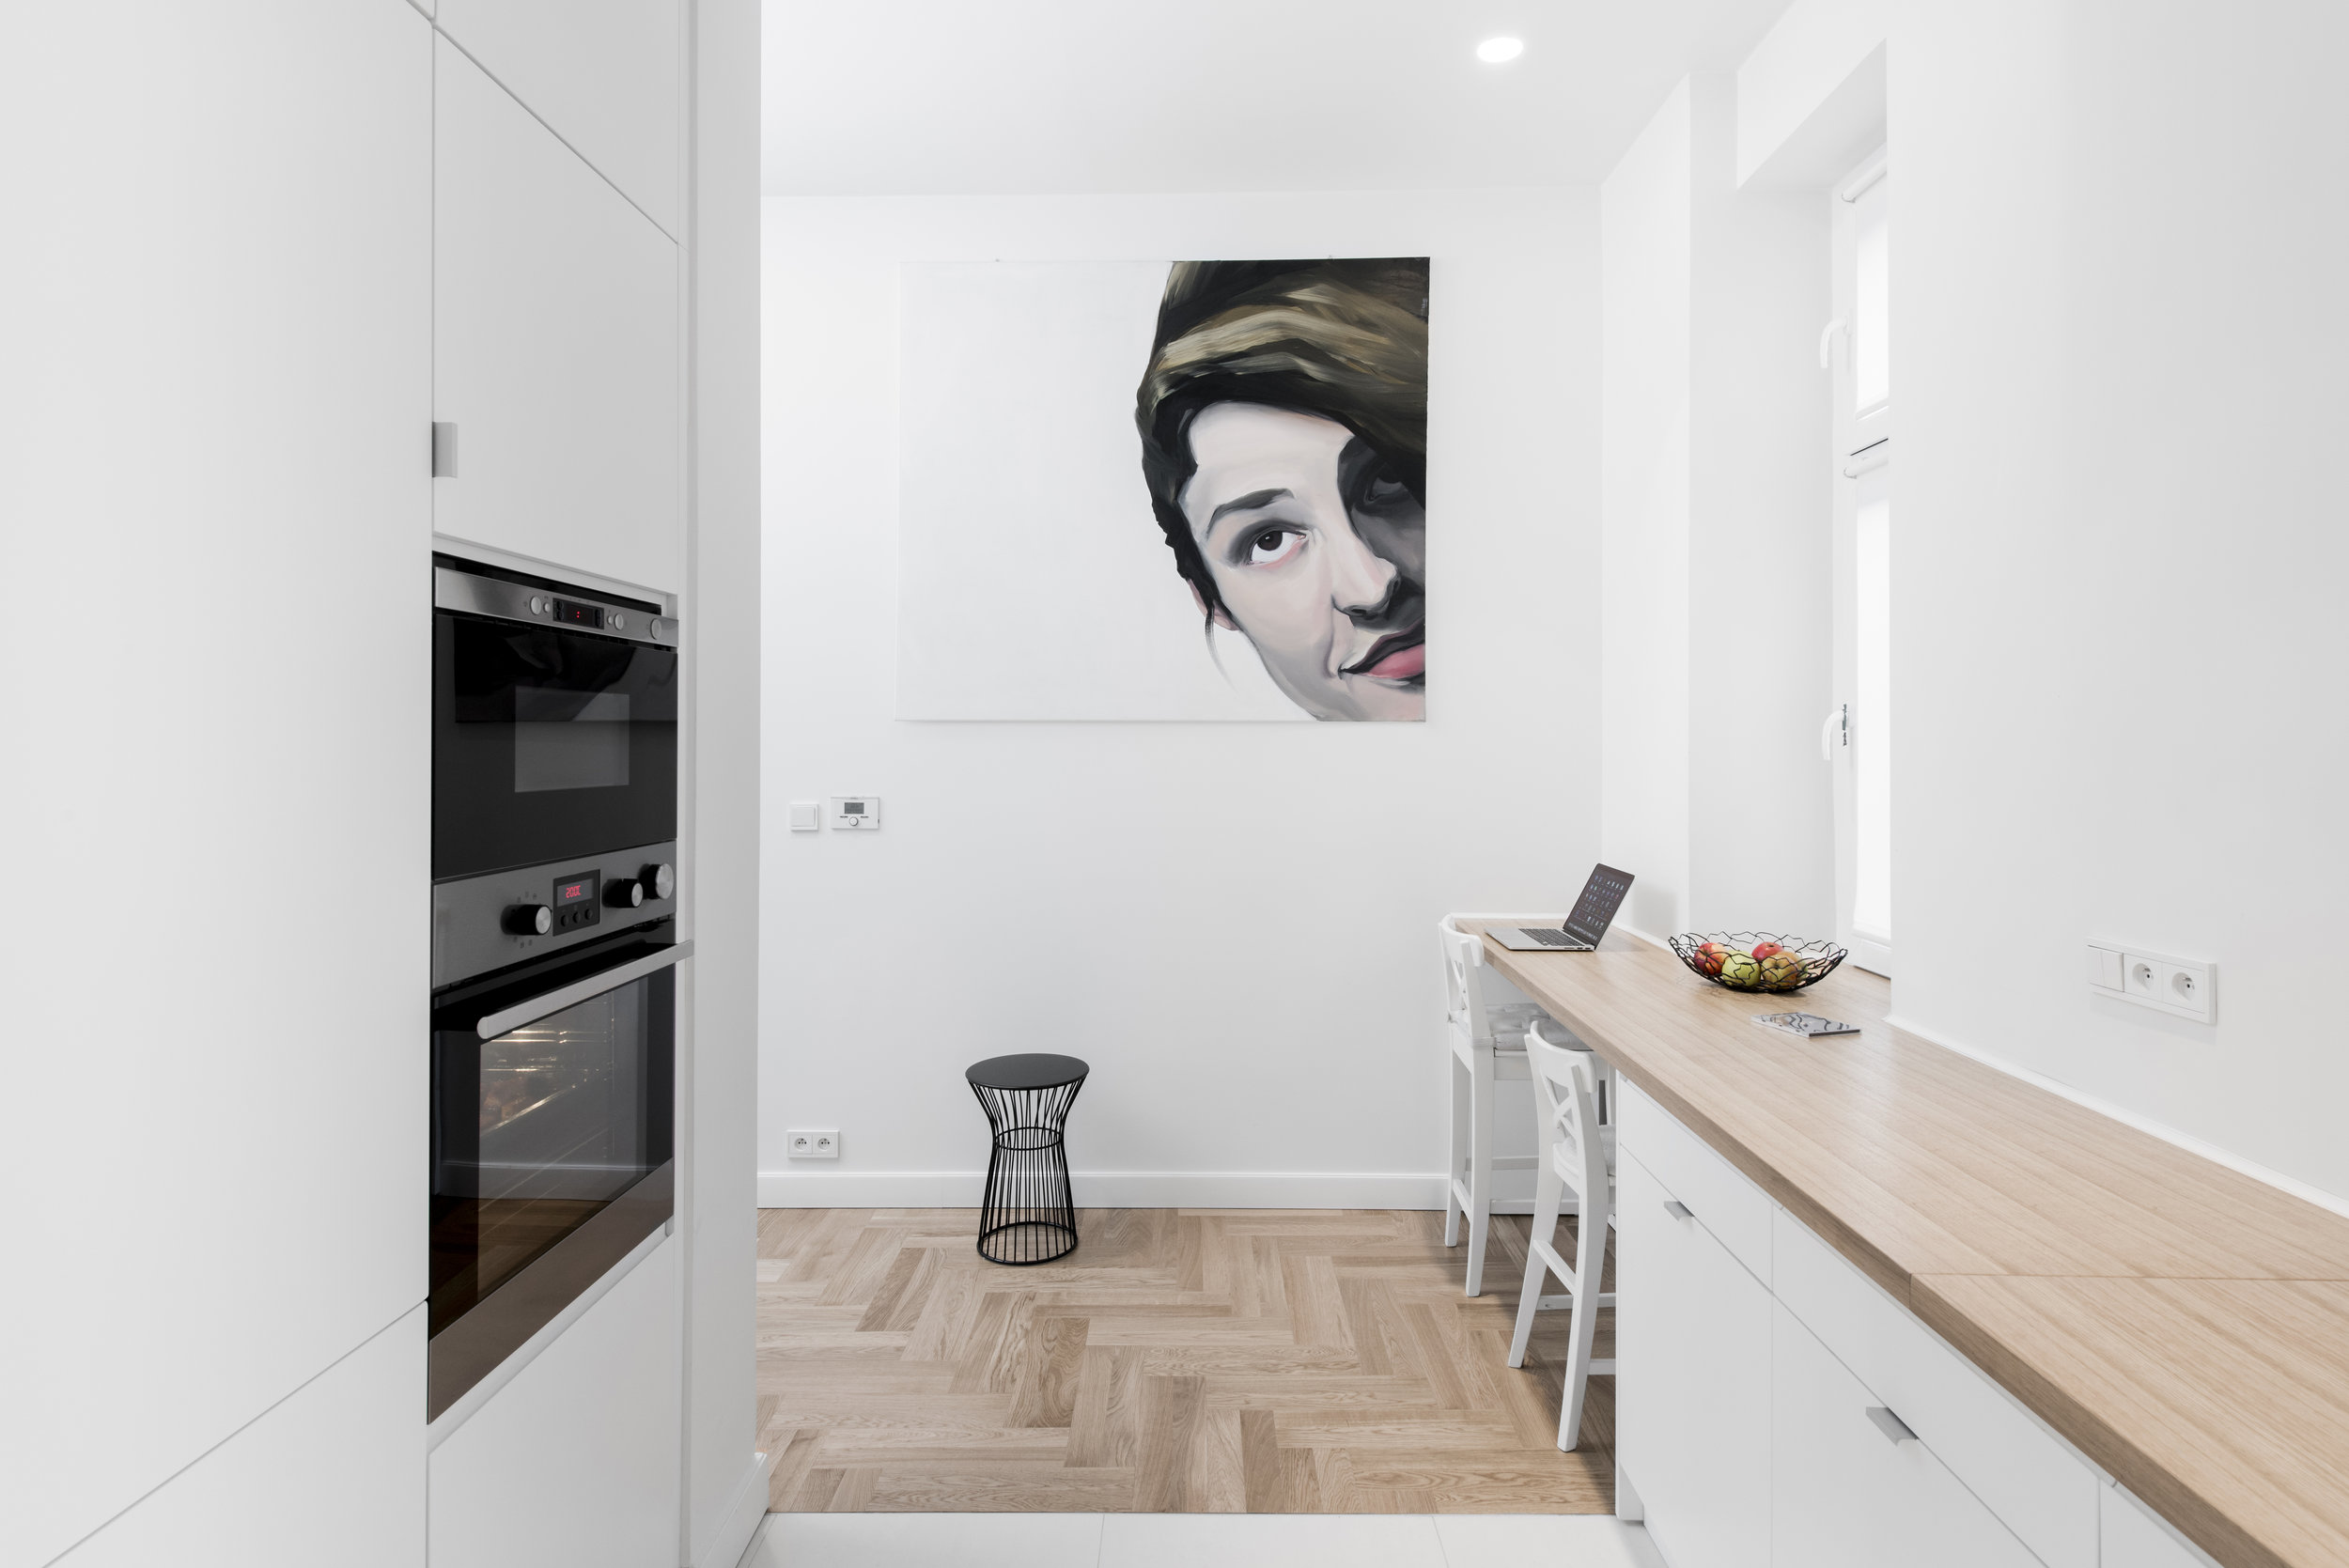 biała-kuchnia.jpg